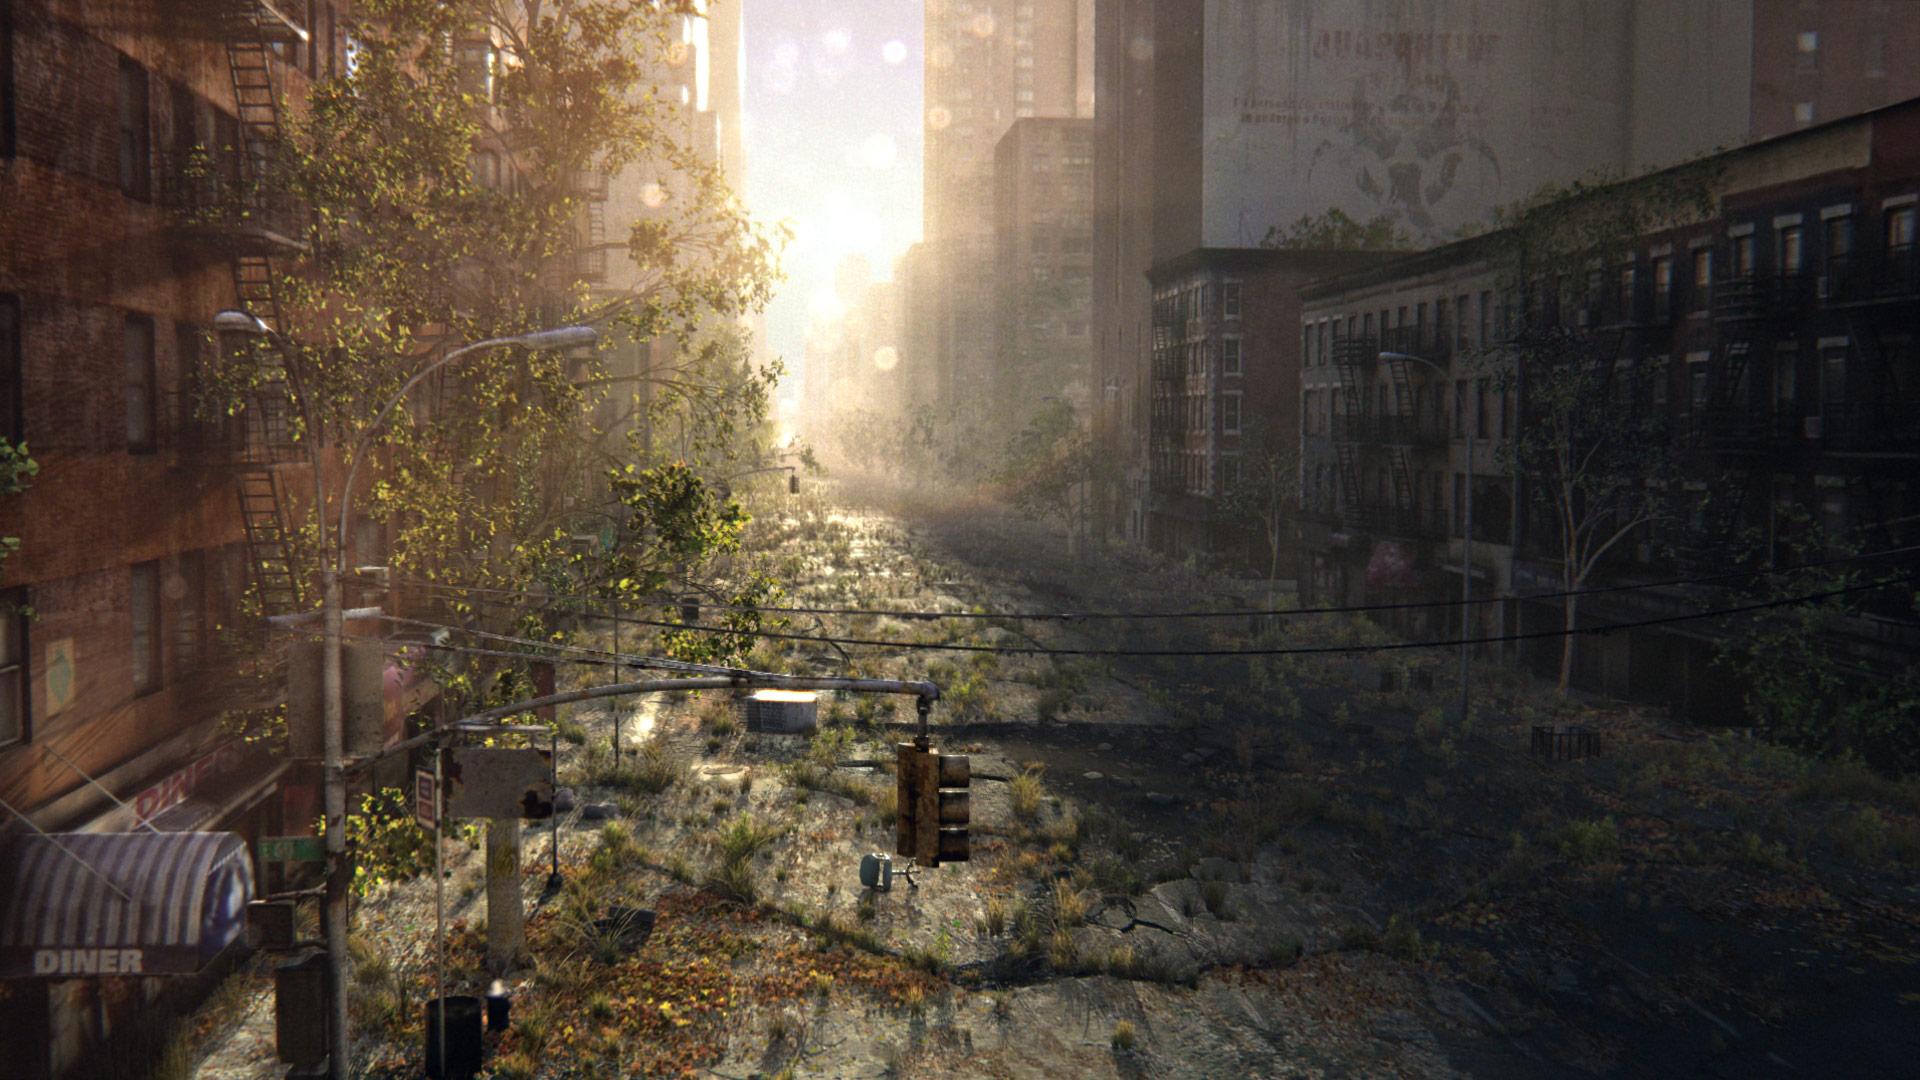 Ini yang akan terjadi jika manusia tiba-tiba hilang dari Bumi